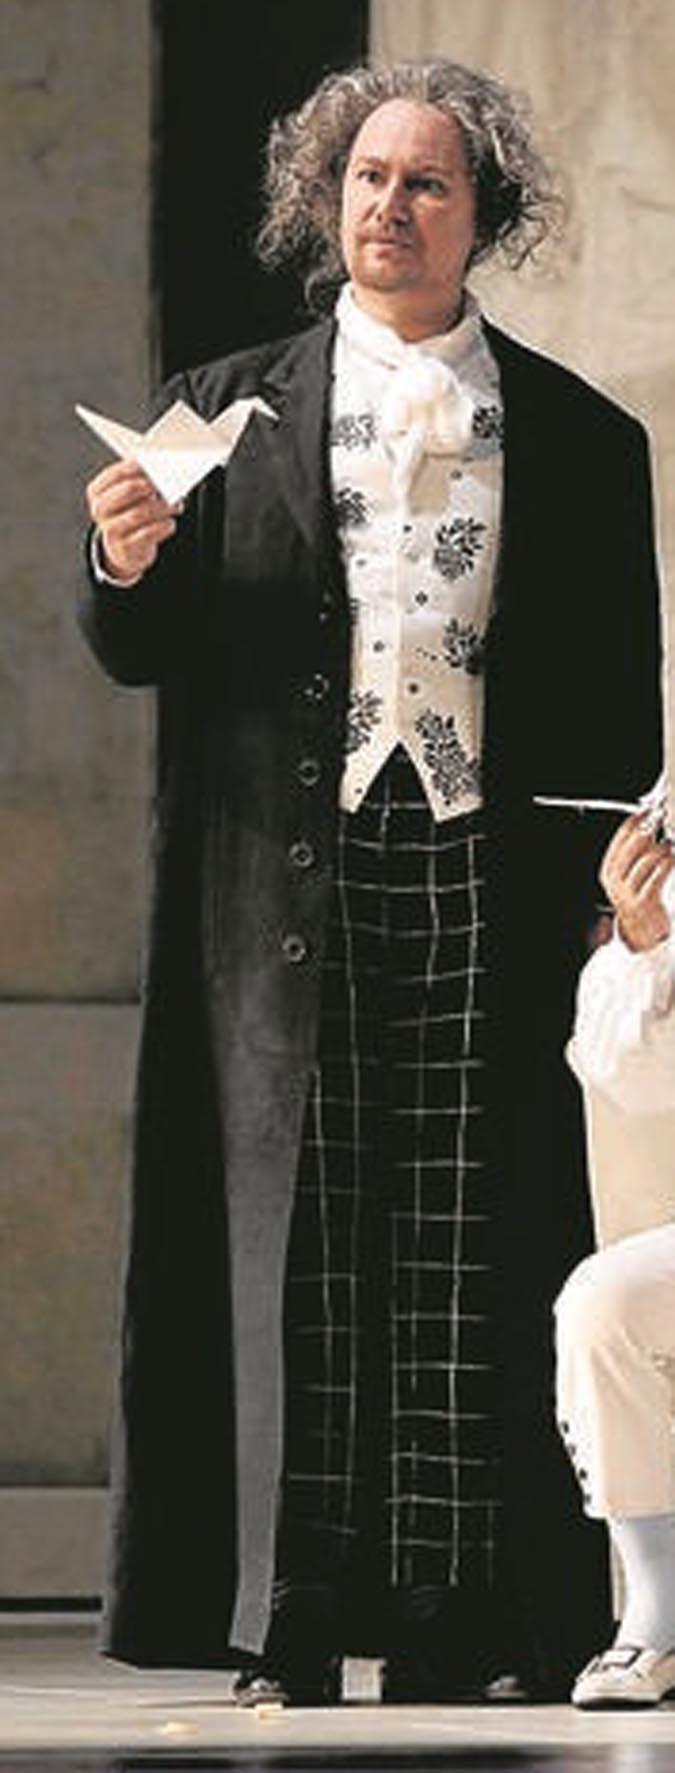 Ruggero Raimondi, costumi di Renata Schussheim, regia di Emilio Sagi, Teatro Real, Madrid, 2005.